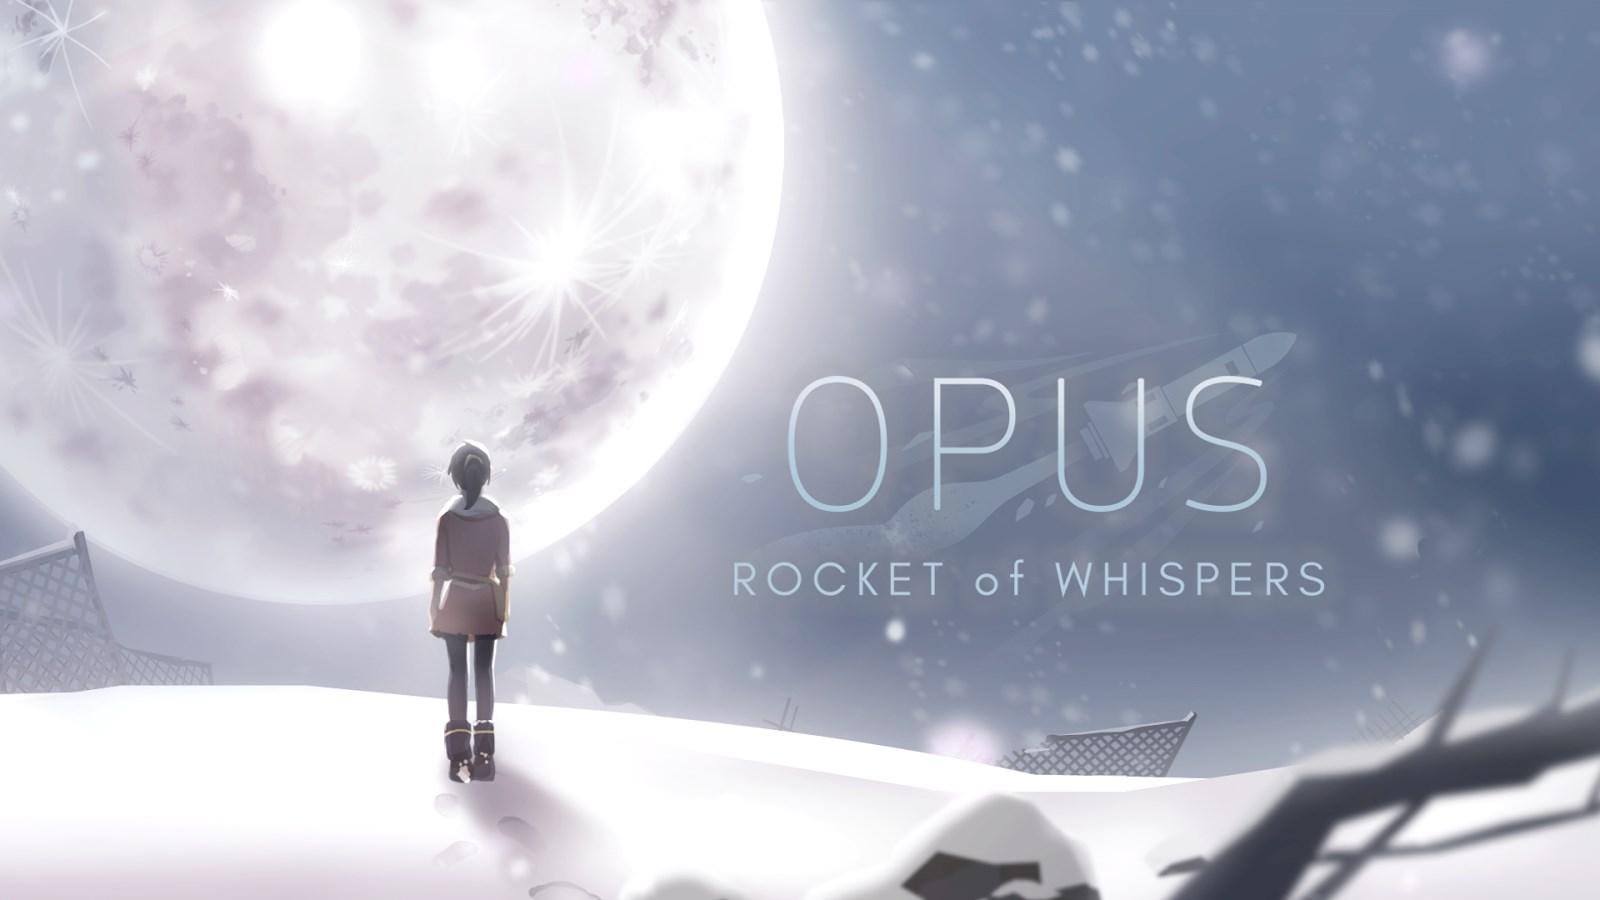 OPUS: Rocket of Whispers - Imagem 1 do software